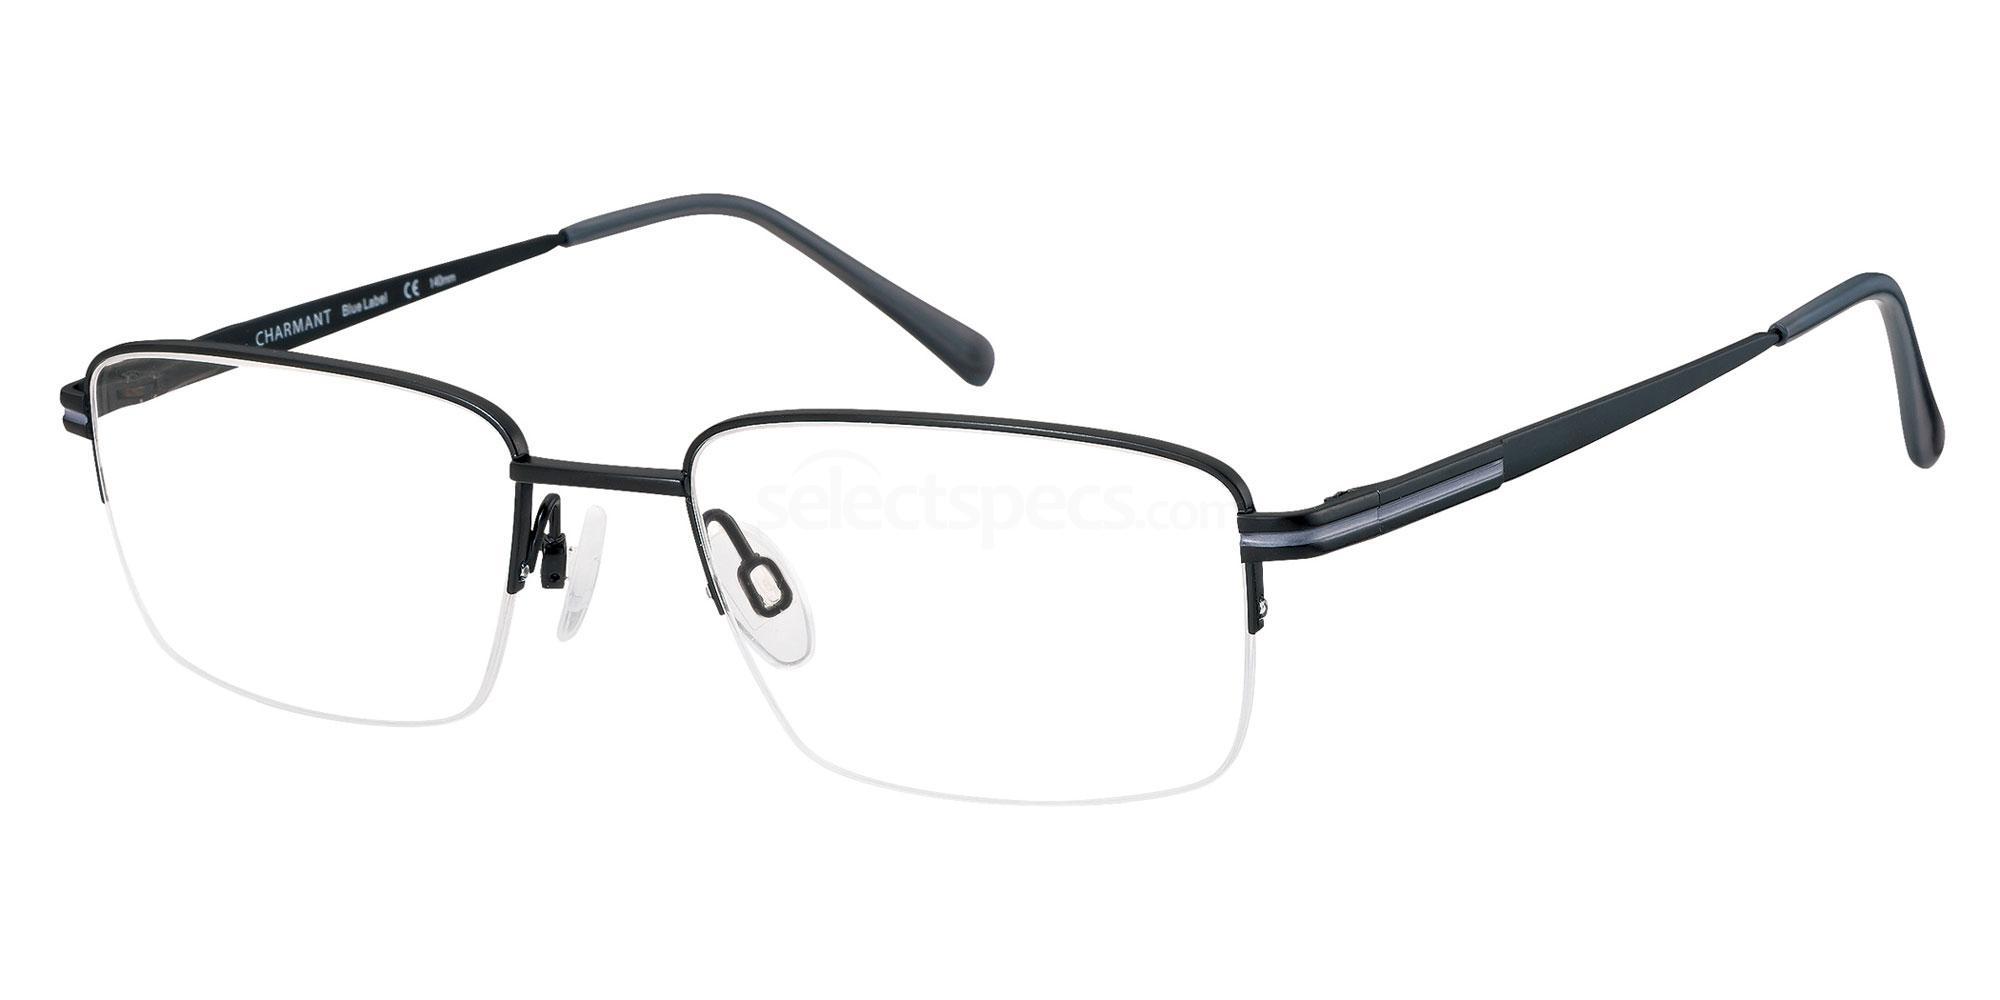 BK CH16115 Glasses, Charmant Blue Label